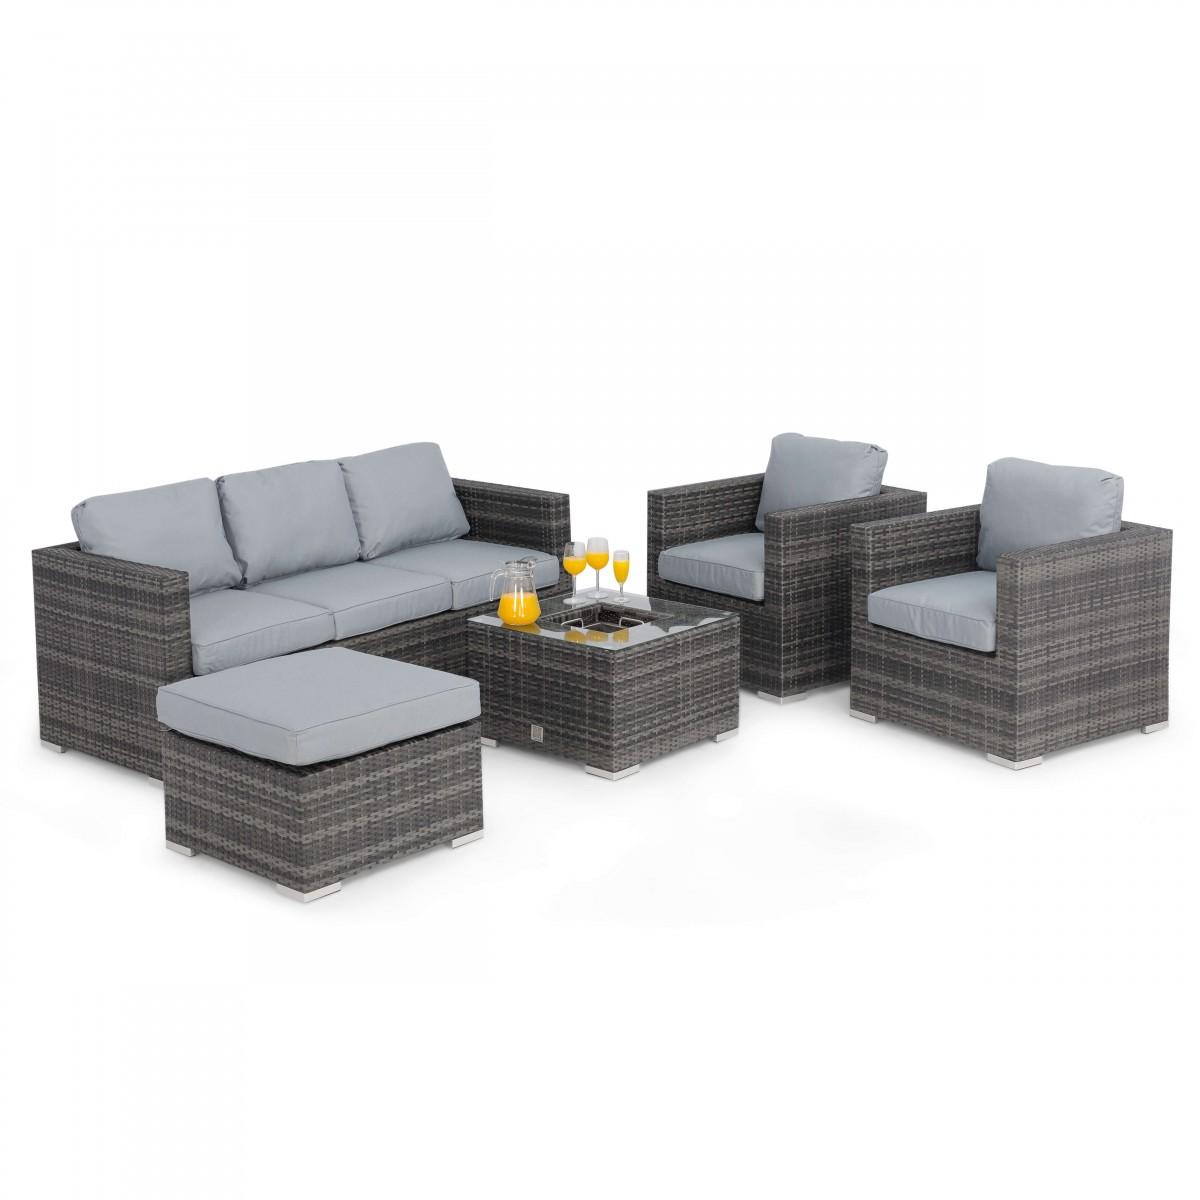 maze rattan furniture georgia 3 seat grey sofa set fla-102525 ICAFOXN